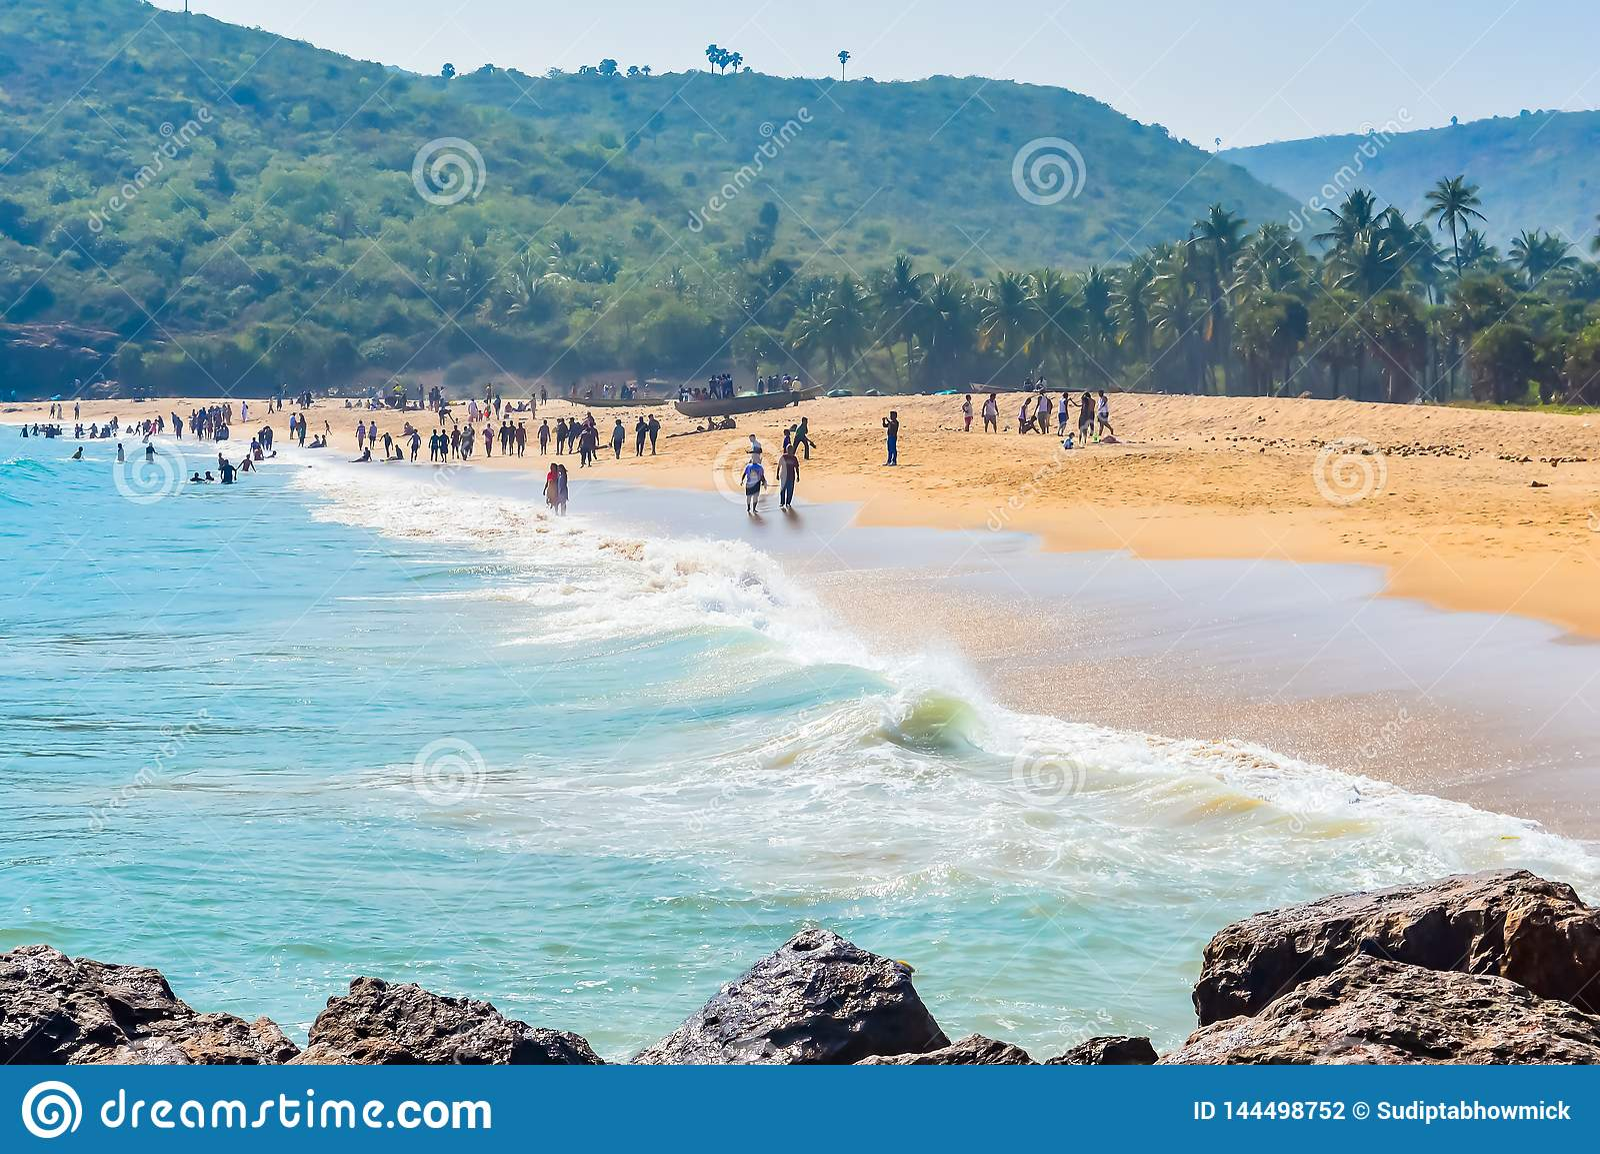 Yarada海滩,维沙卡帕特南,印度2018年12月10日-放松和享用在Yarada海滩的人们 海岸地区被围拢